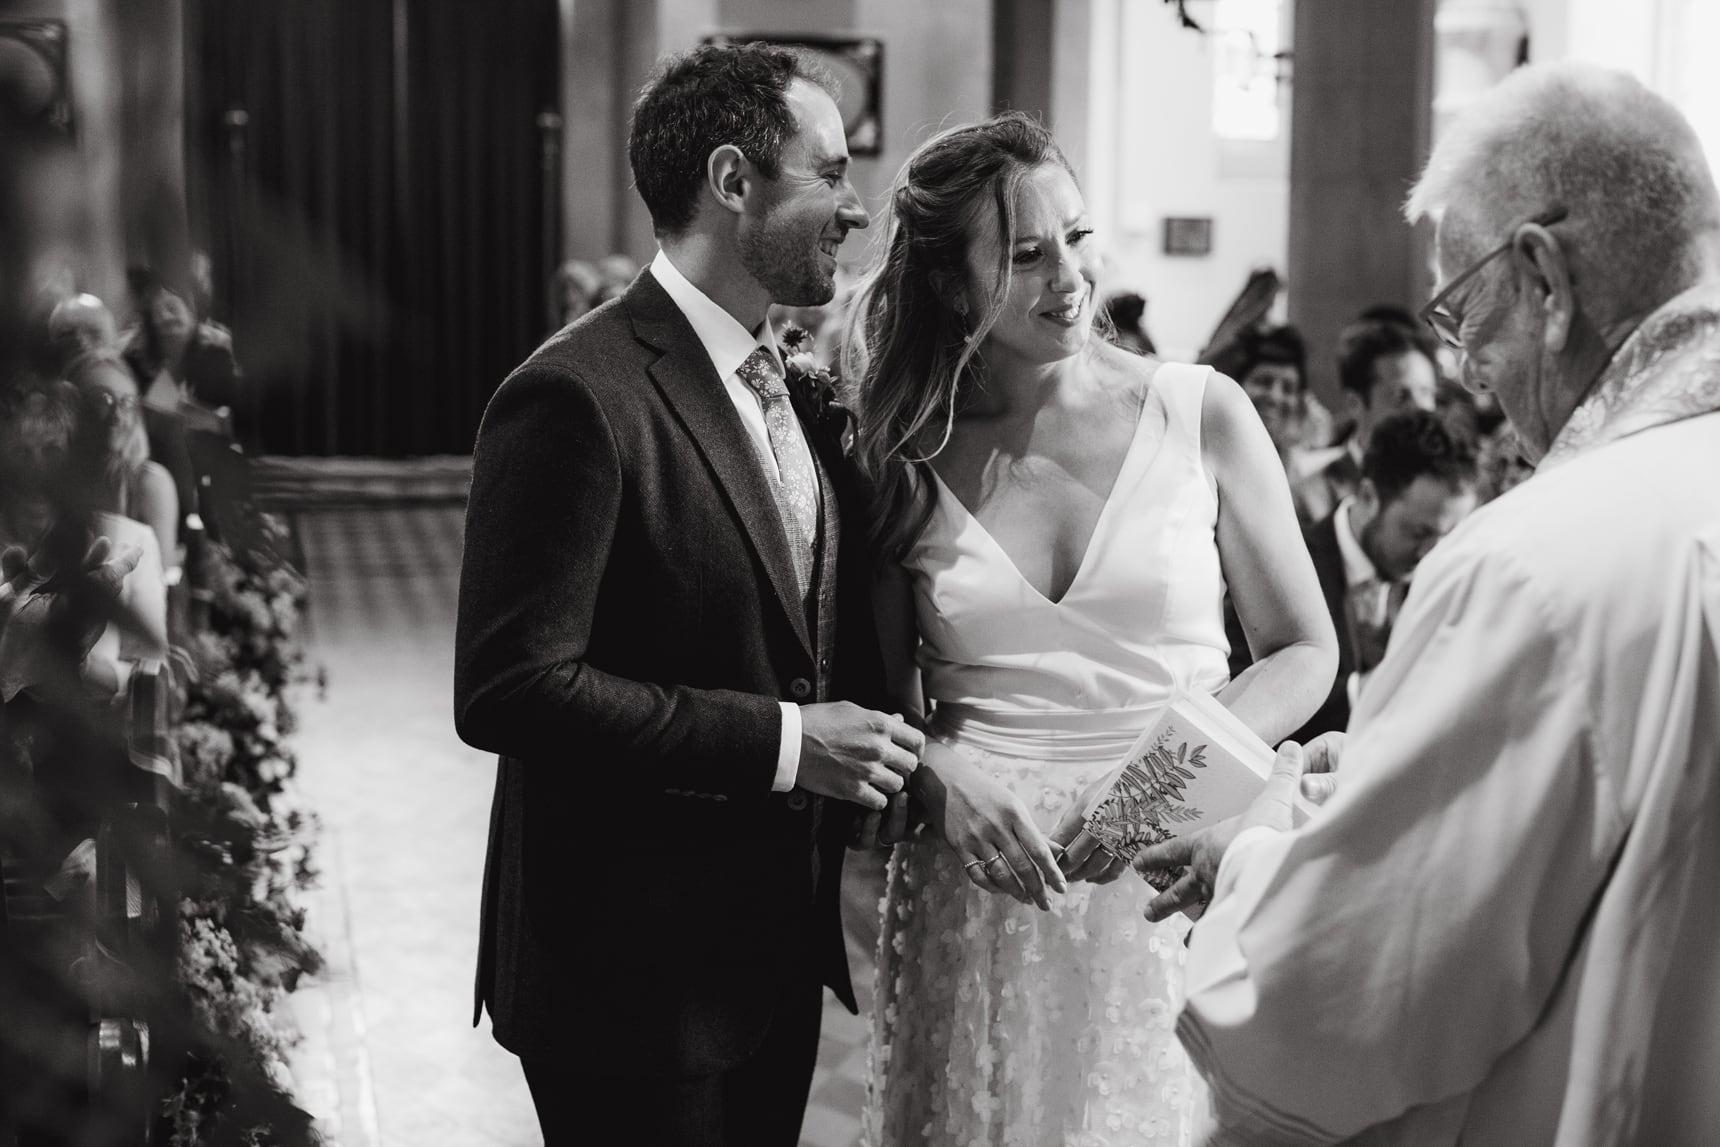 weddings before covid